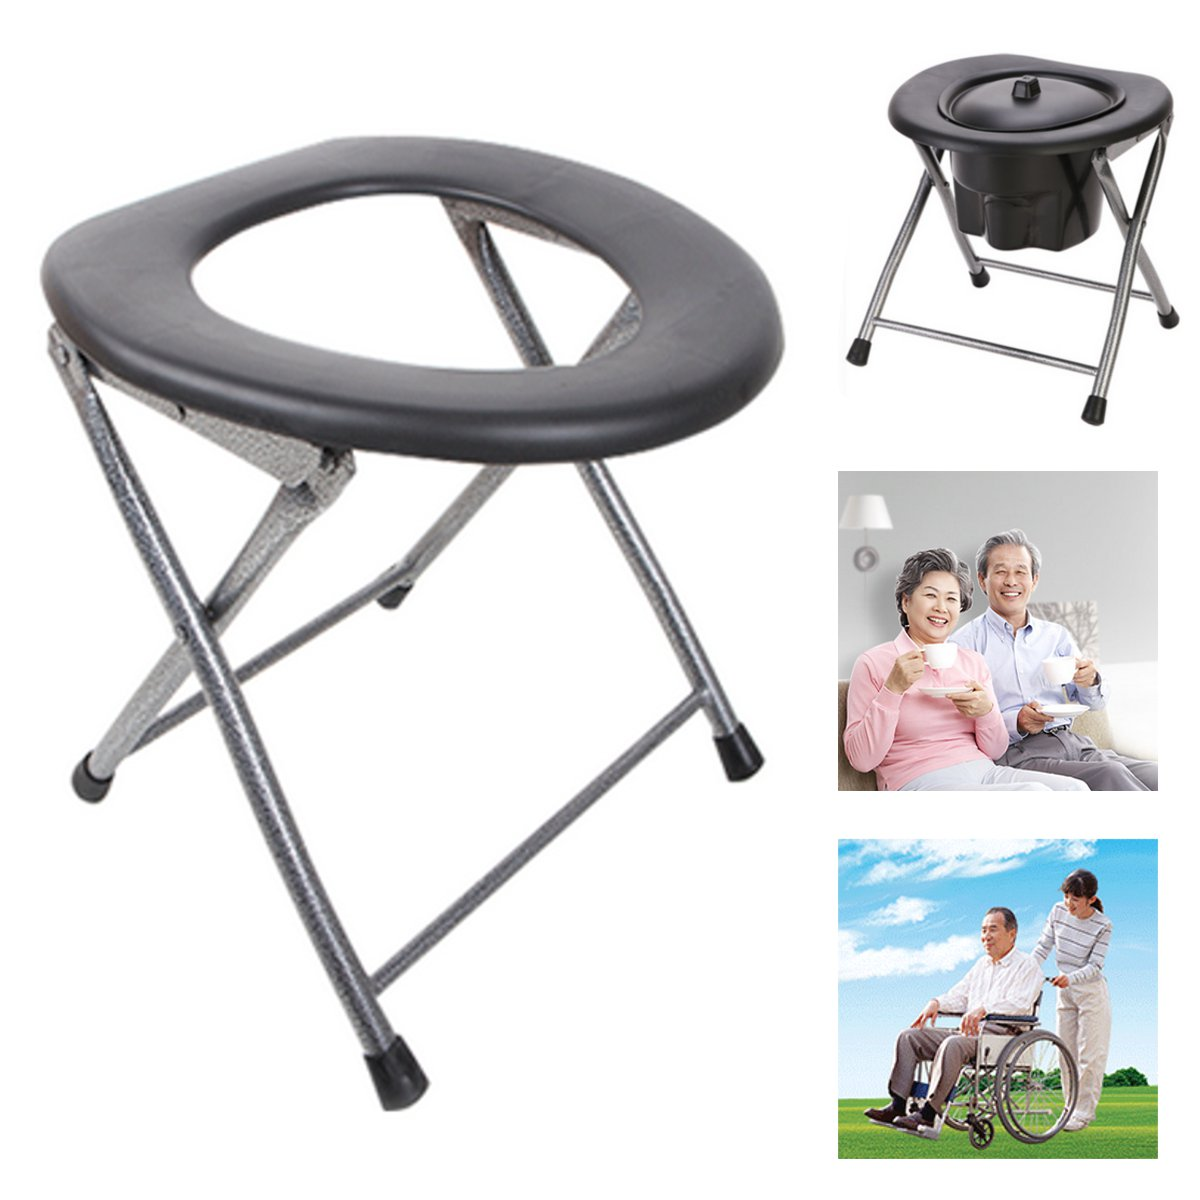 folding chair for bathroom dream catcher hammock ipree portable toilet stool end 7 21 2018 8 15 pm